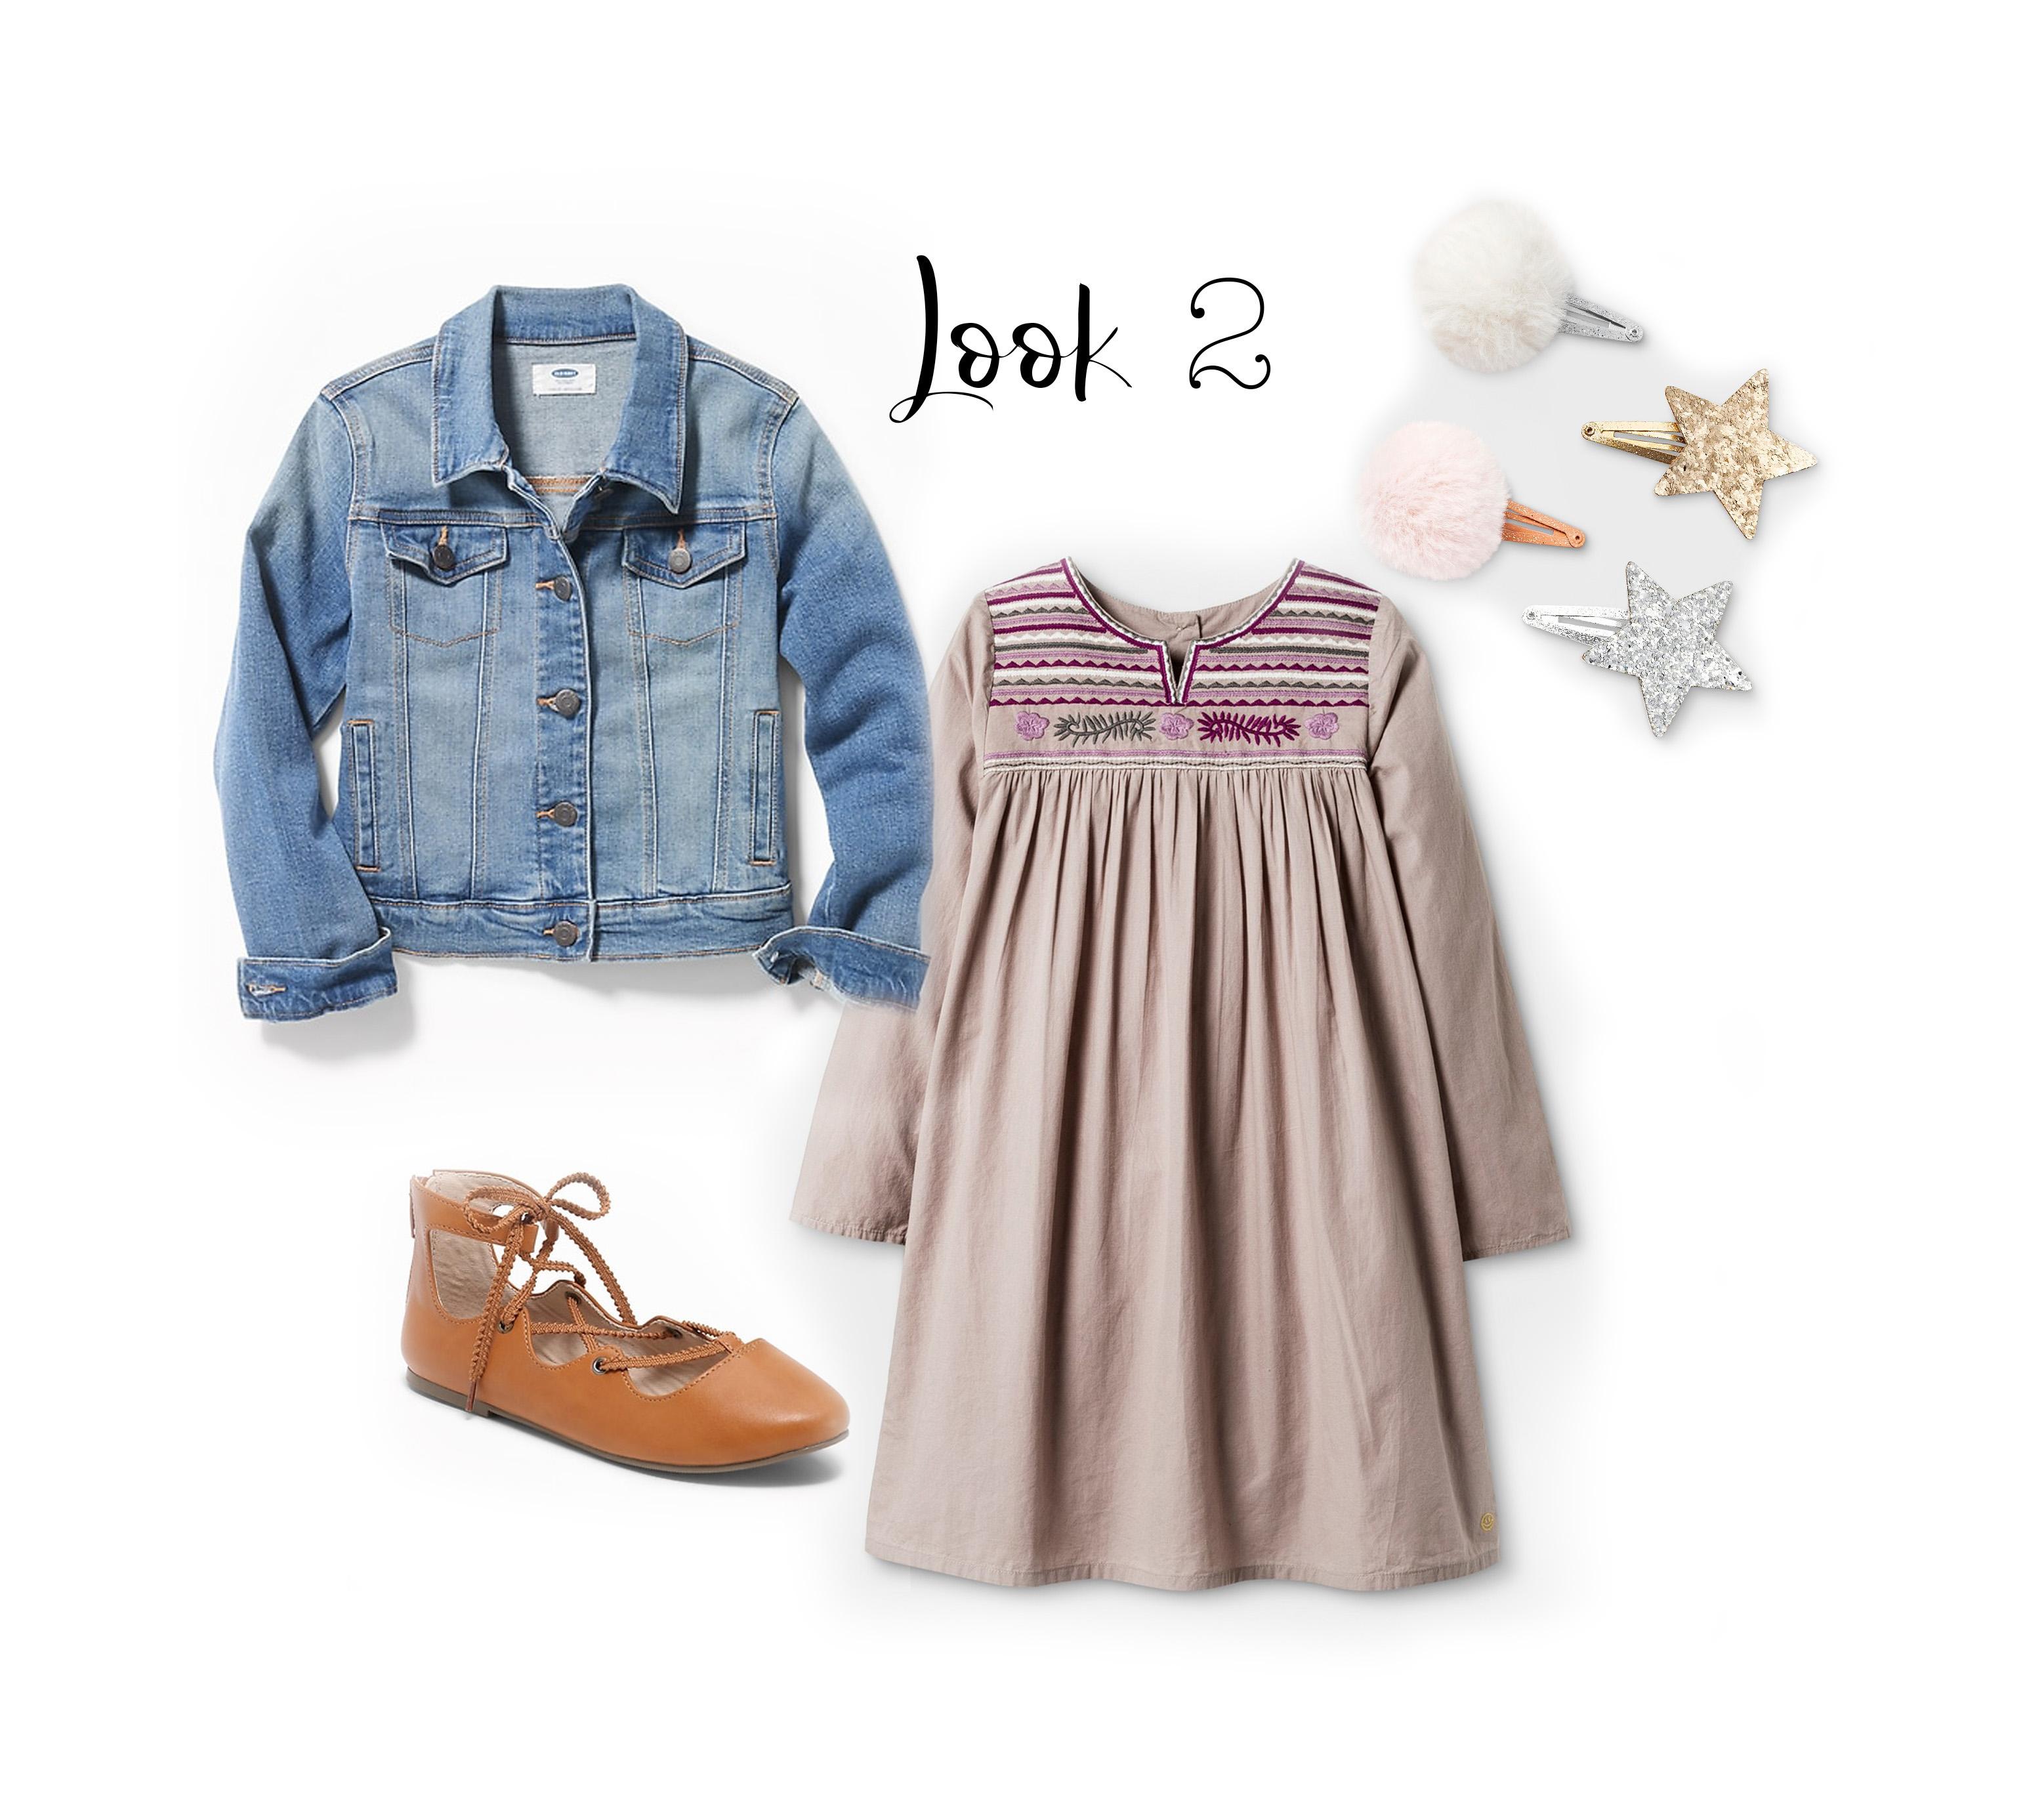 Cute Outfits for Older Girls – Jordan & Co